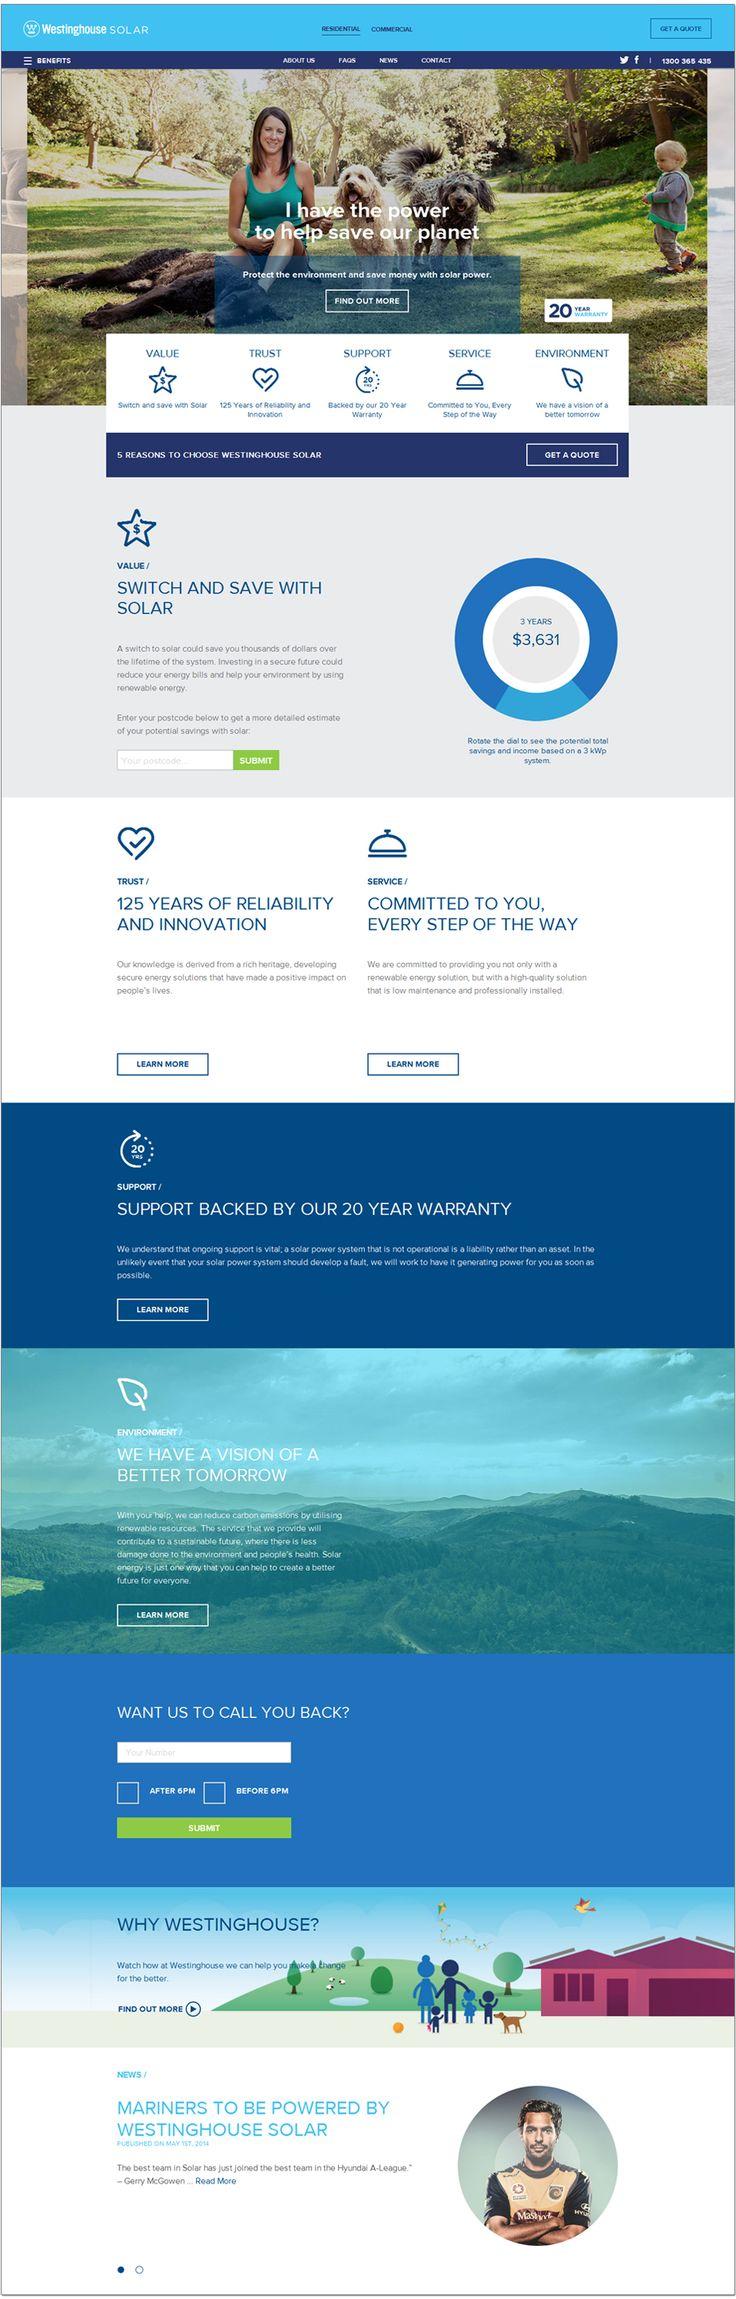 Layout photoshop web design website template tutorials tutorial 022 - Best Product Website Inspiration Corporate Website Designwebsite Design Layoutwebsite